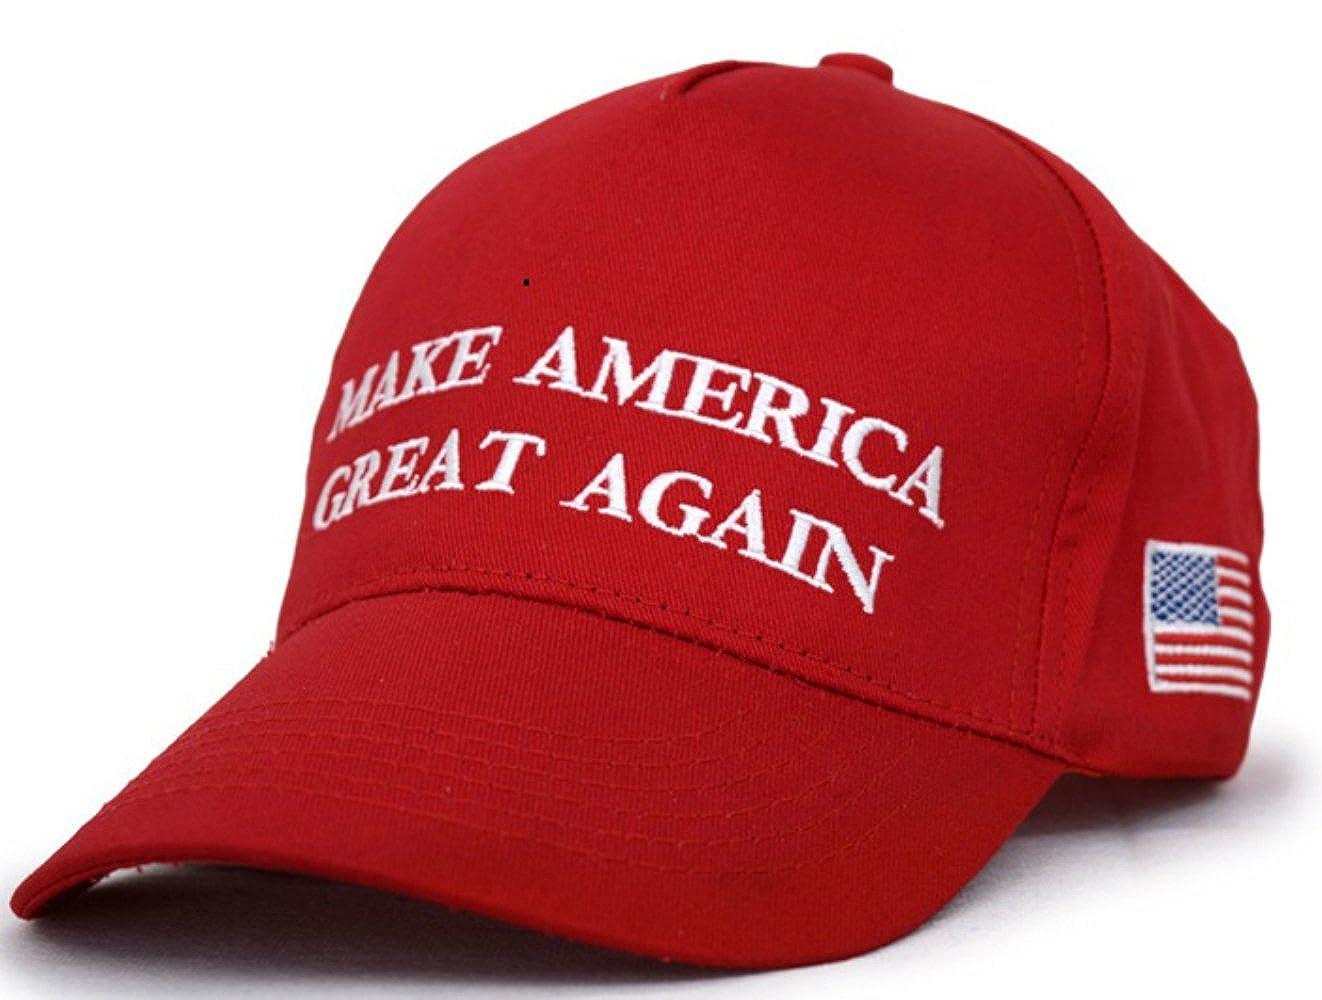 Make America Great Again Donald Trump USA Cap Adjustable Baseball Hat Women Breathable Eyelets